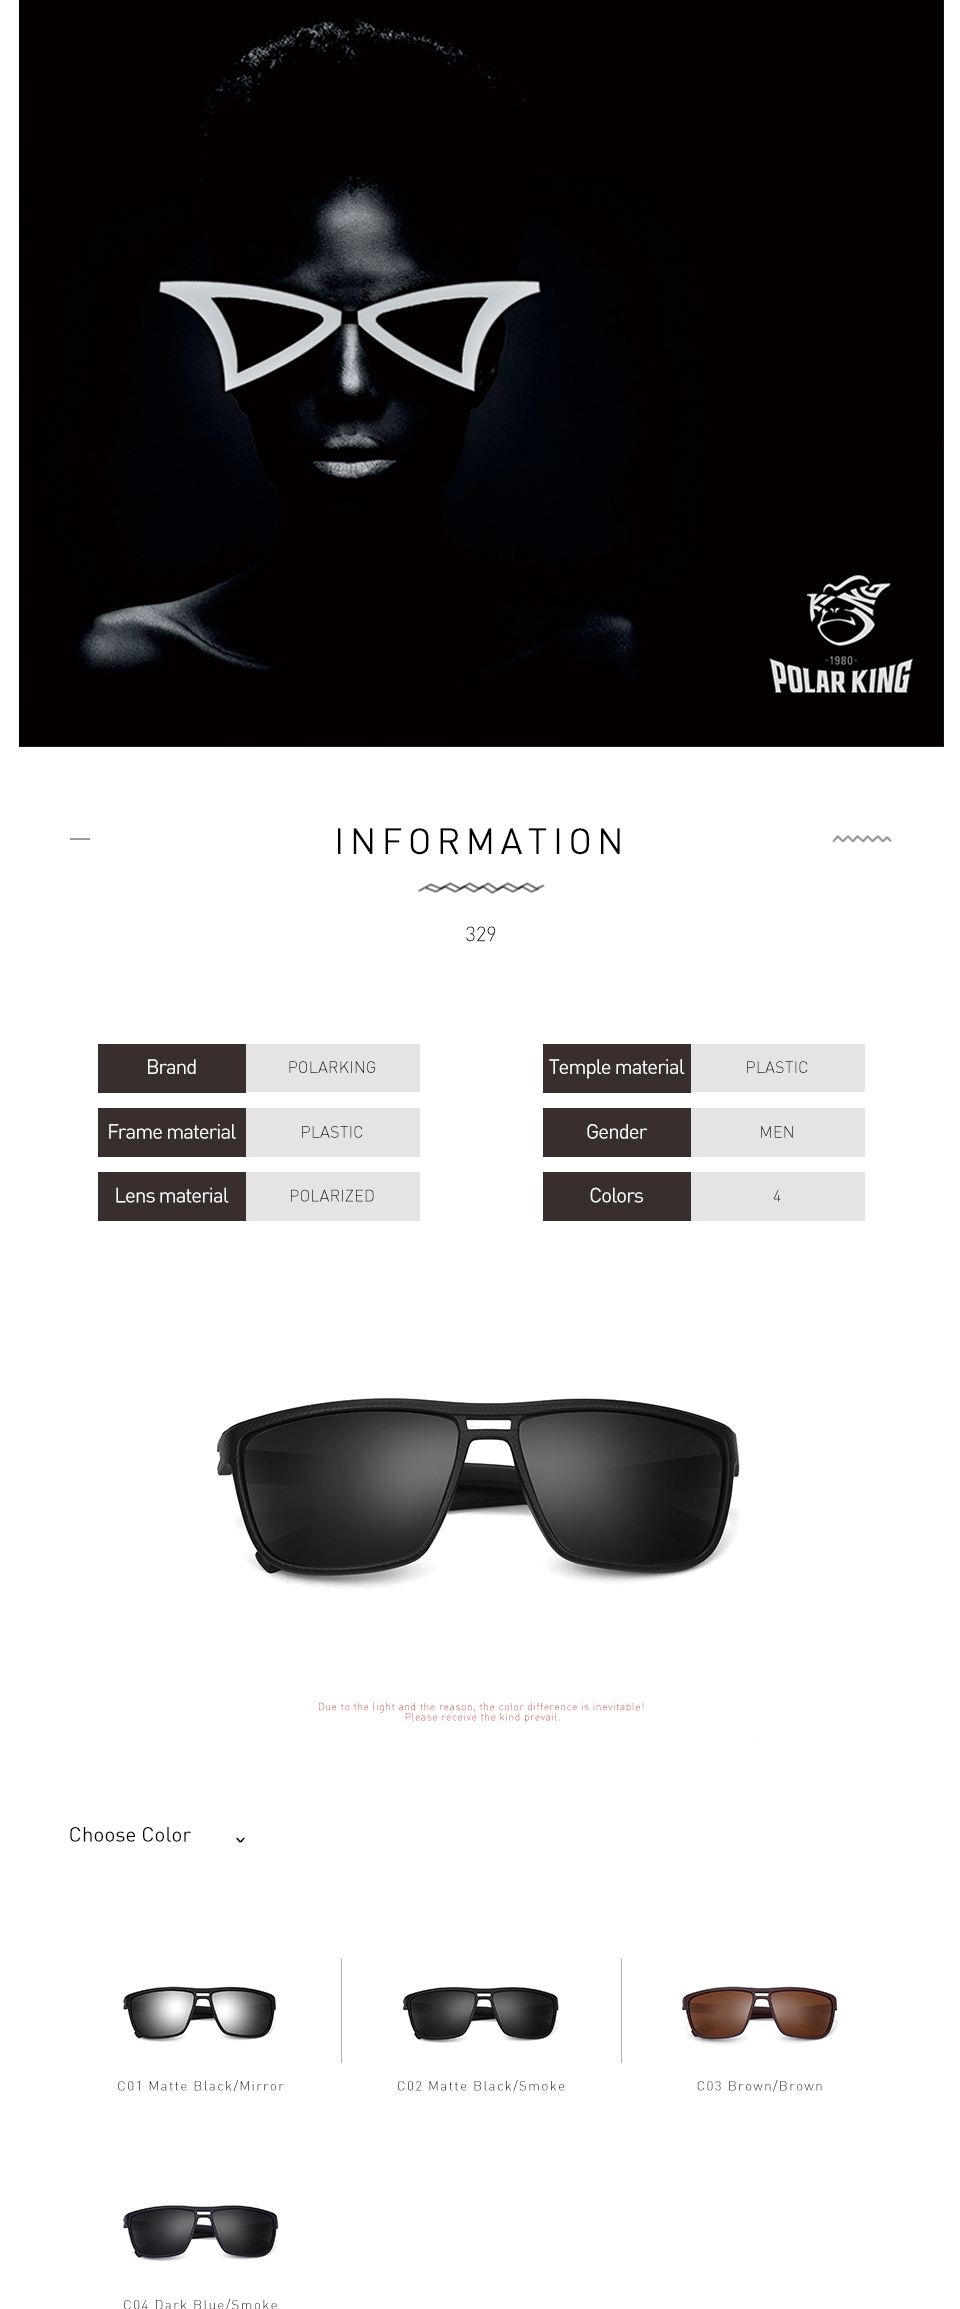 1cc69b5a39 POLARKING Brand Retro Polarized Sunglasses For Men Plastic Oculos ...